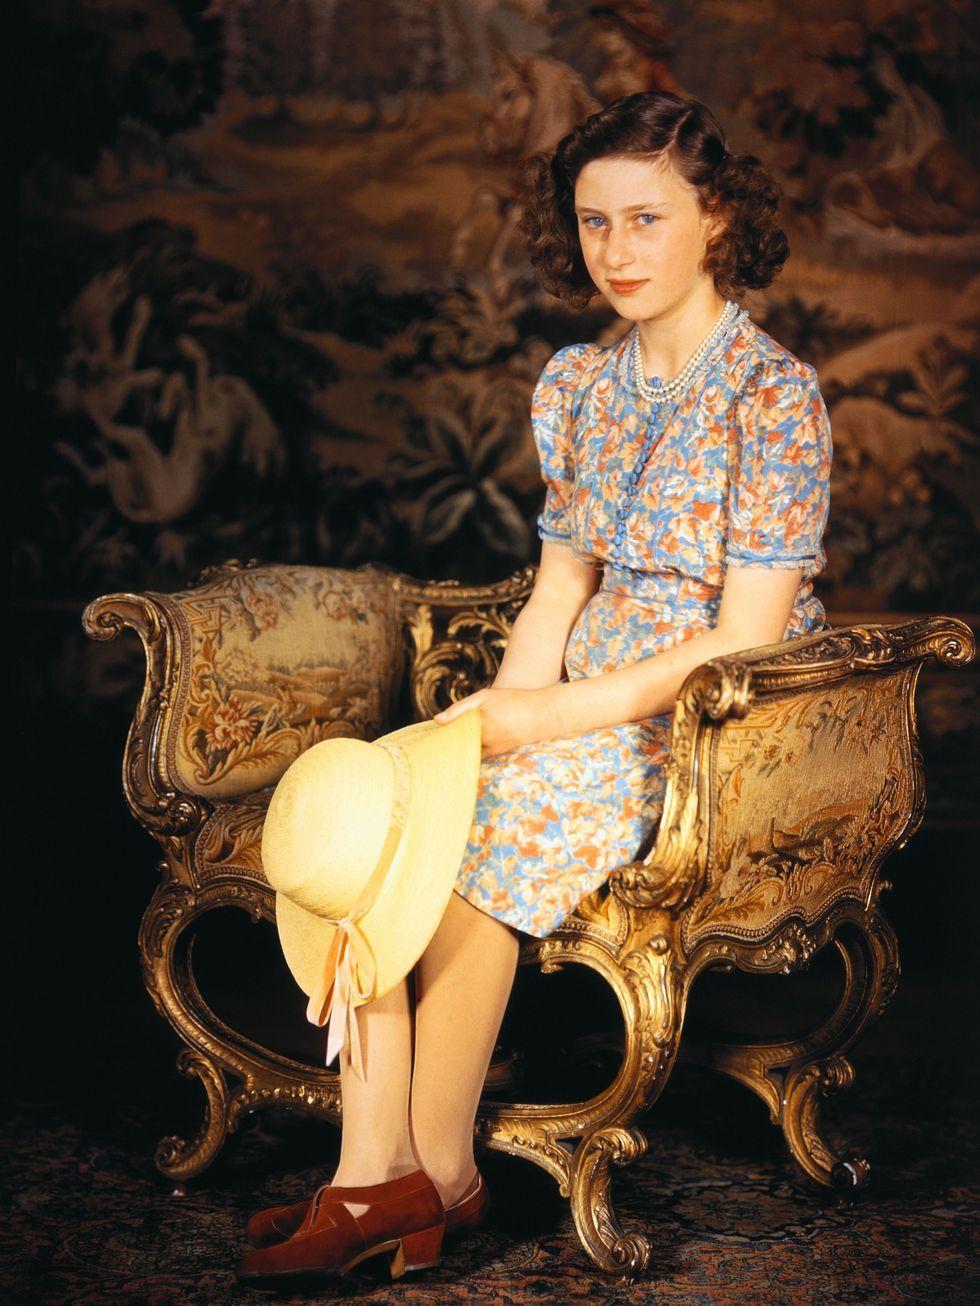 Princess Margaret Rose of England Posing for Photograph